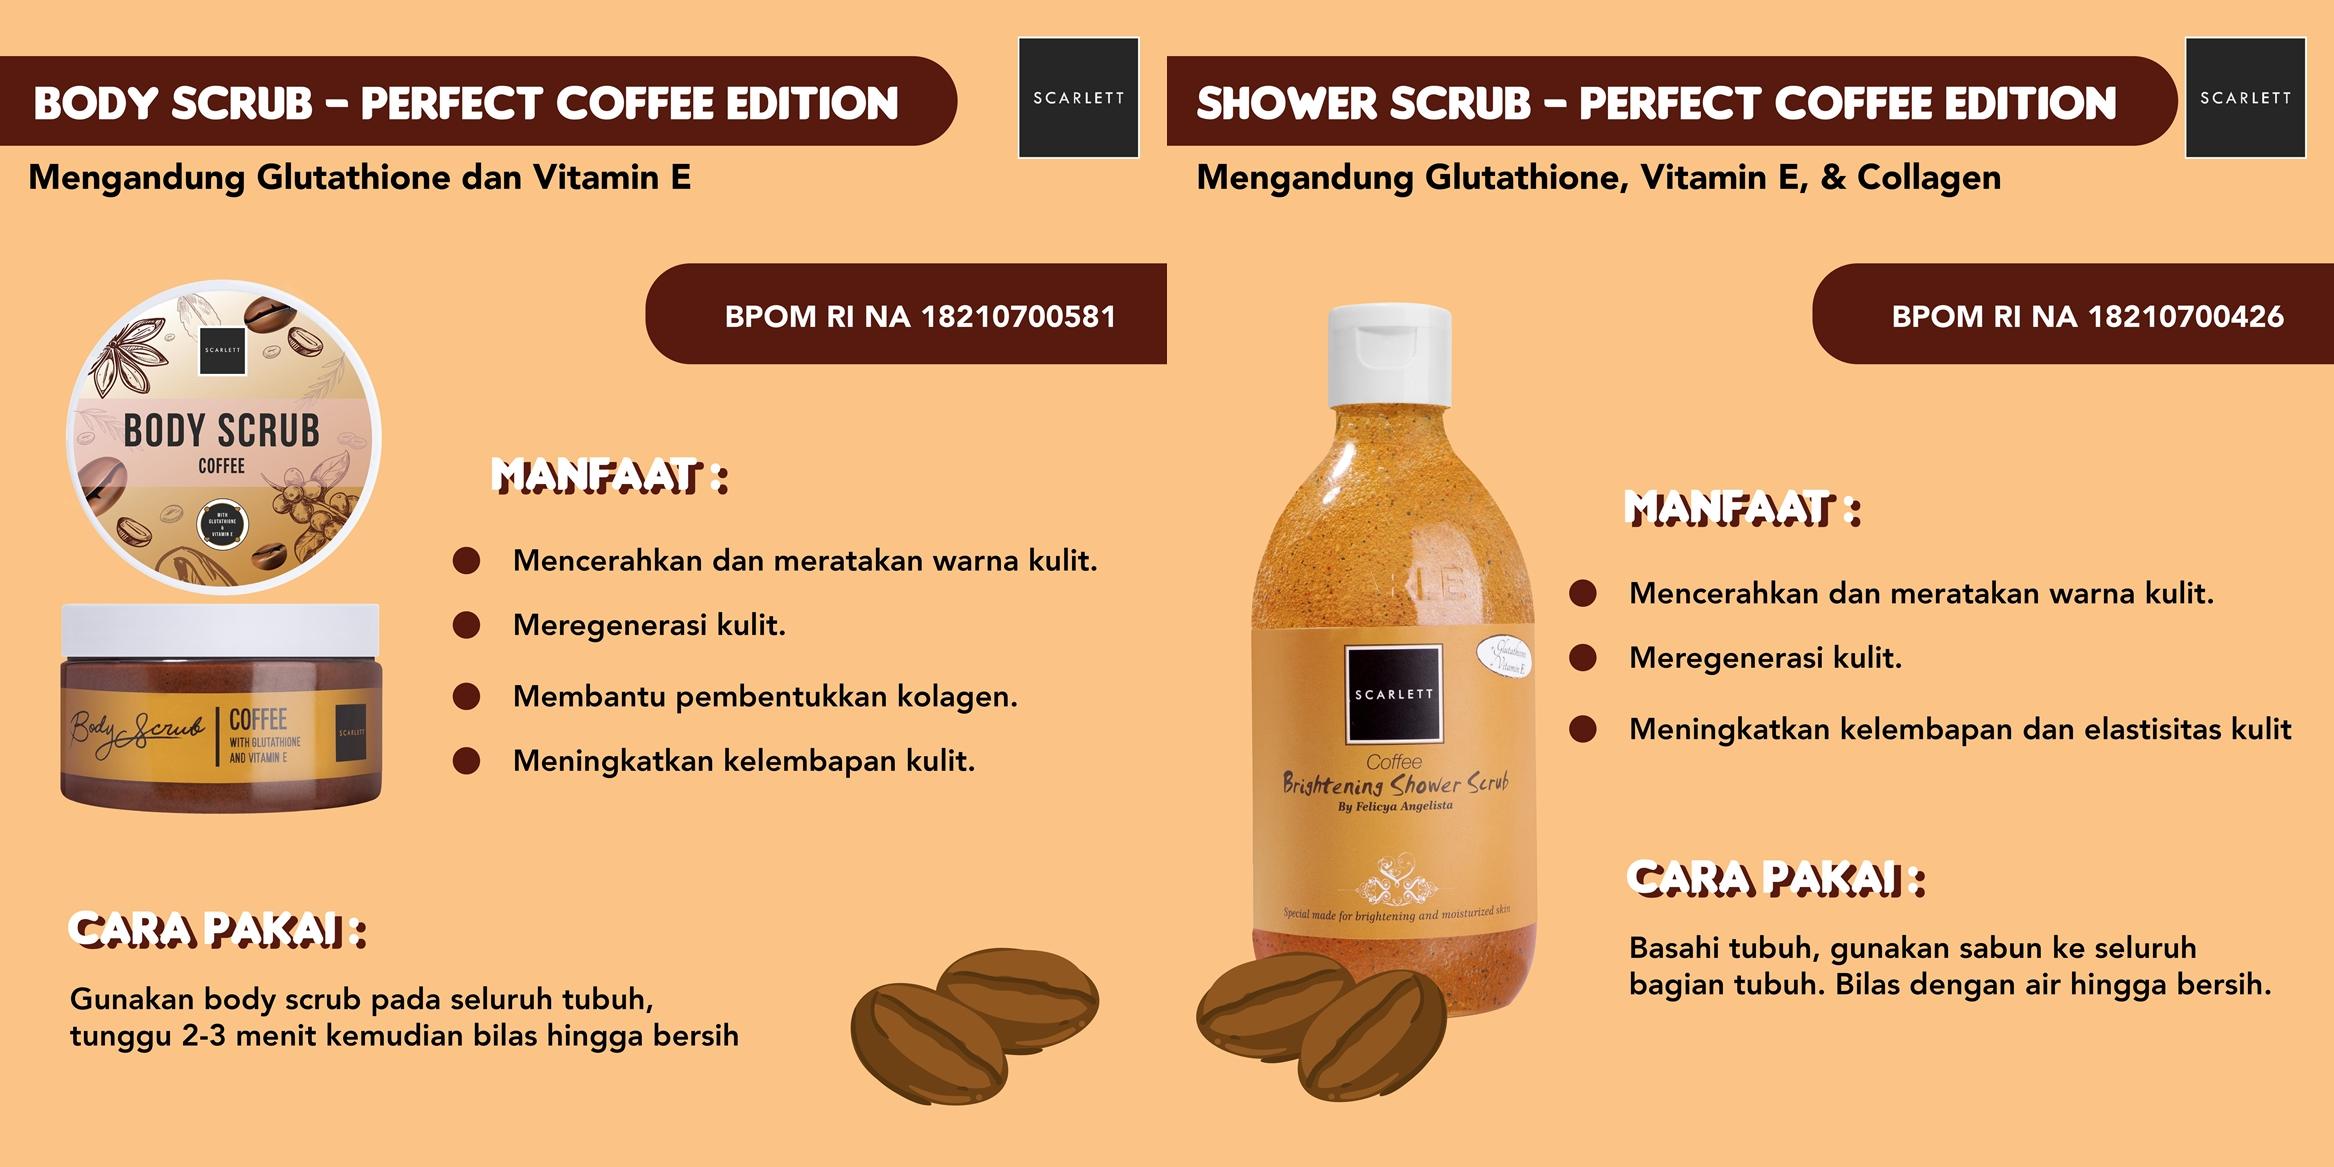 Scarlett Whitening Perfect Coffee Edition by feryarifian